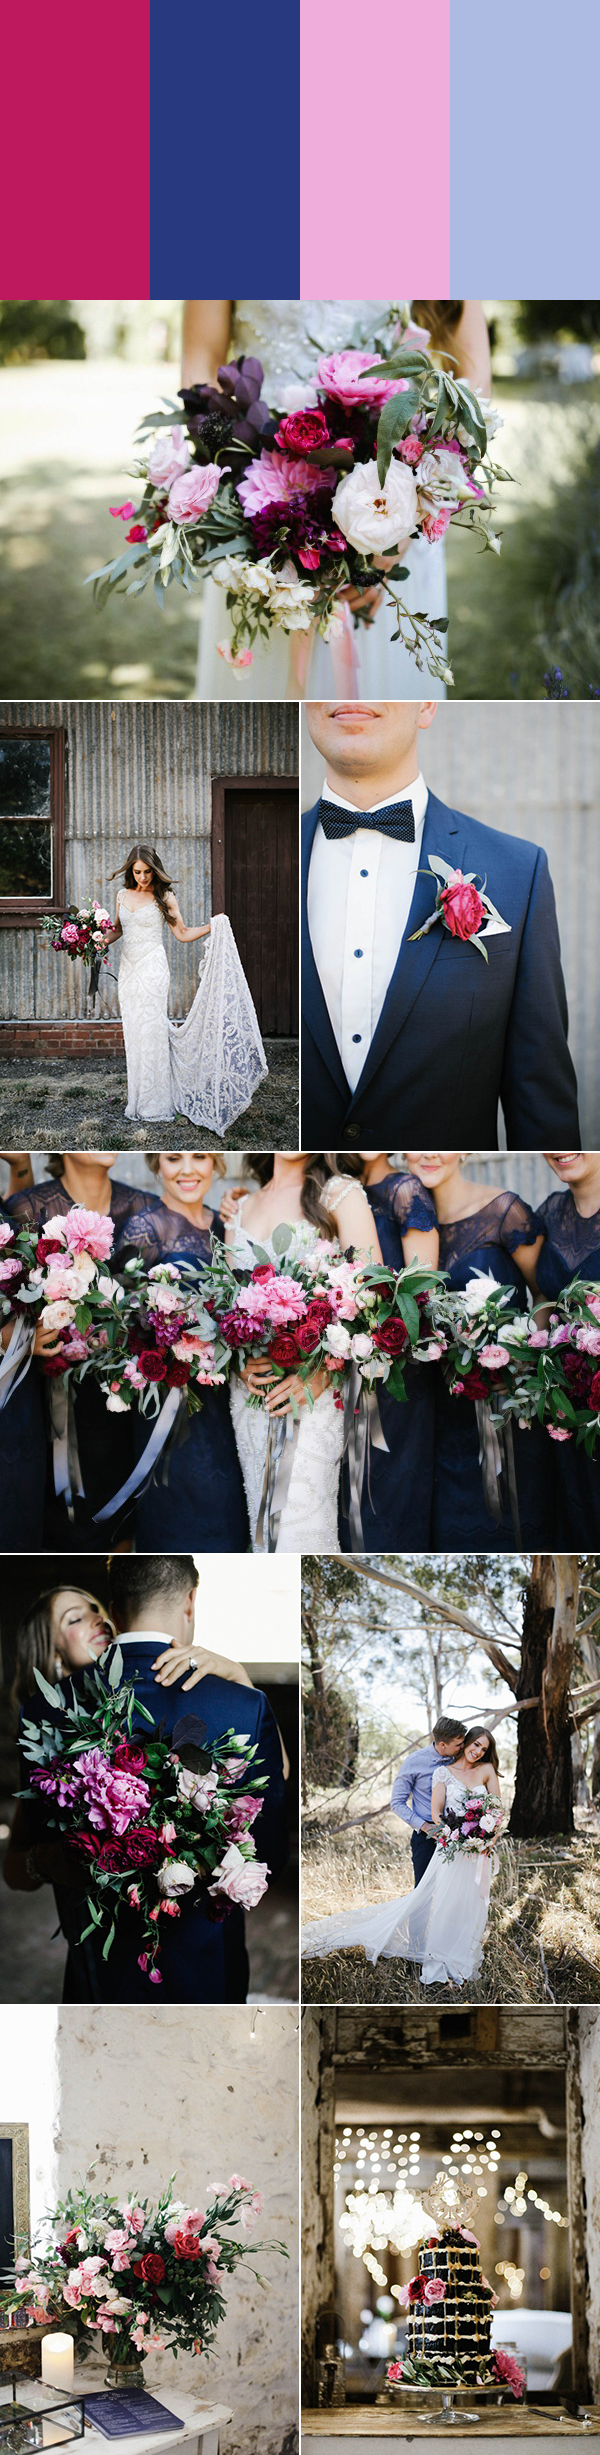 swoonworthy pink wedding color palettes junebug weddings